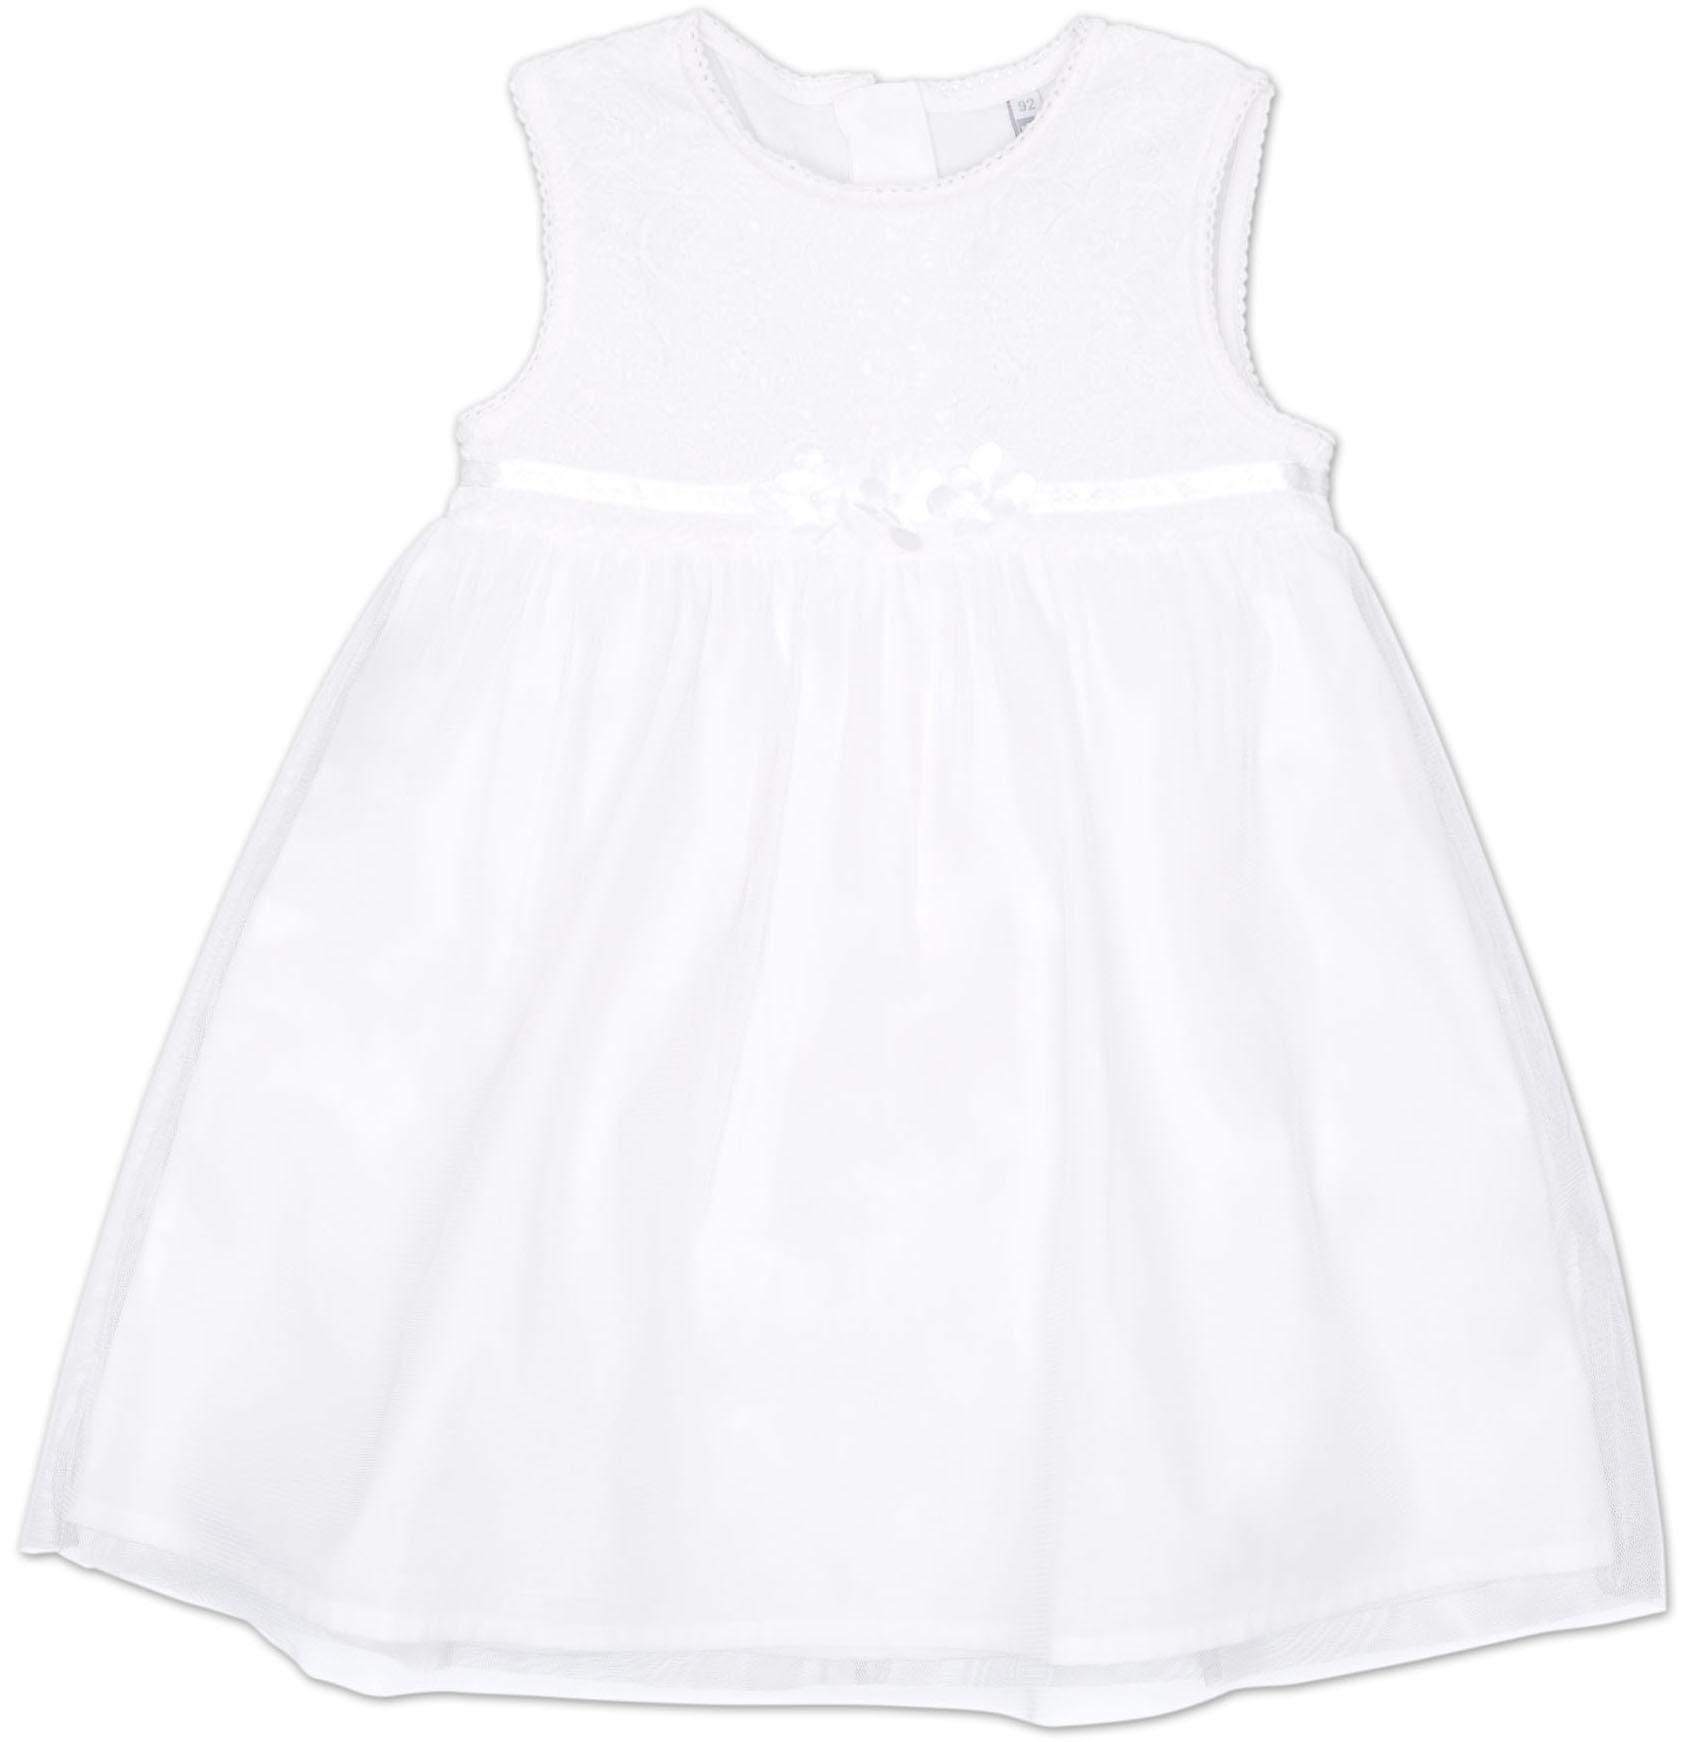 Платья Barkito Платье без рукавов Barkito, Алоха Гавайи!, белое perlitta perlitta платье белое